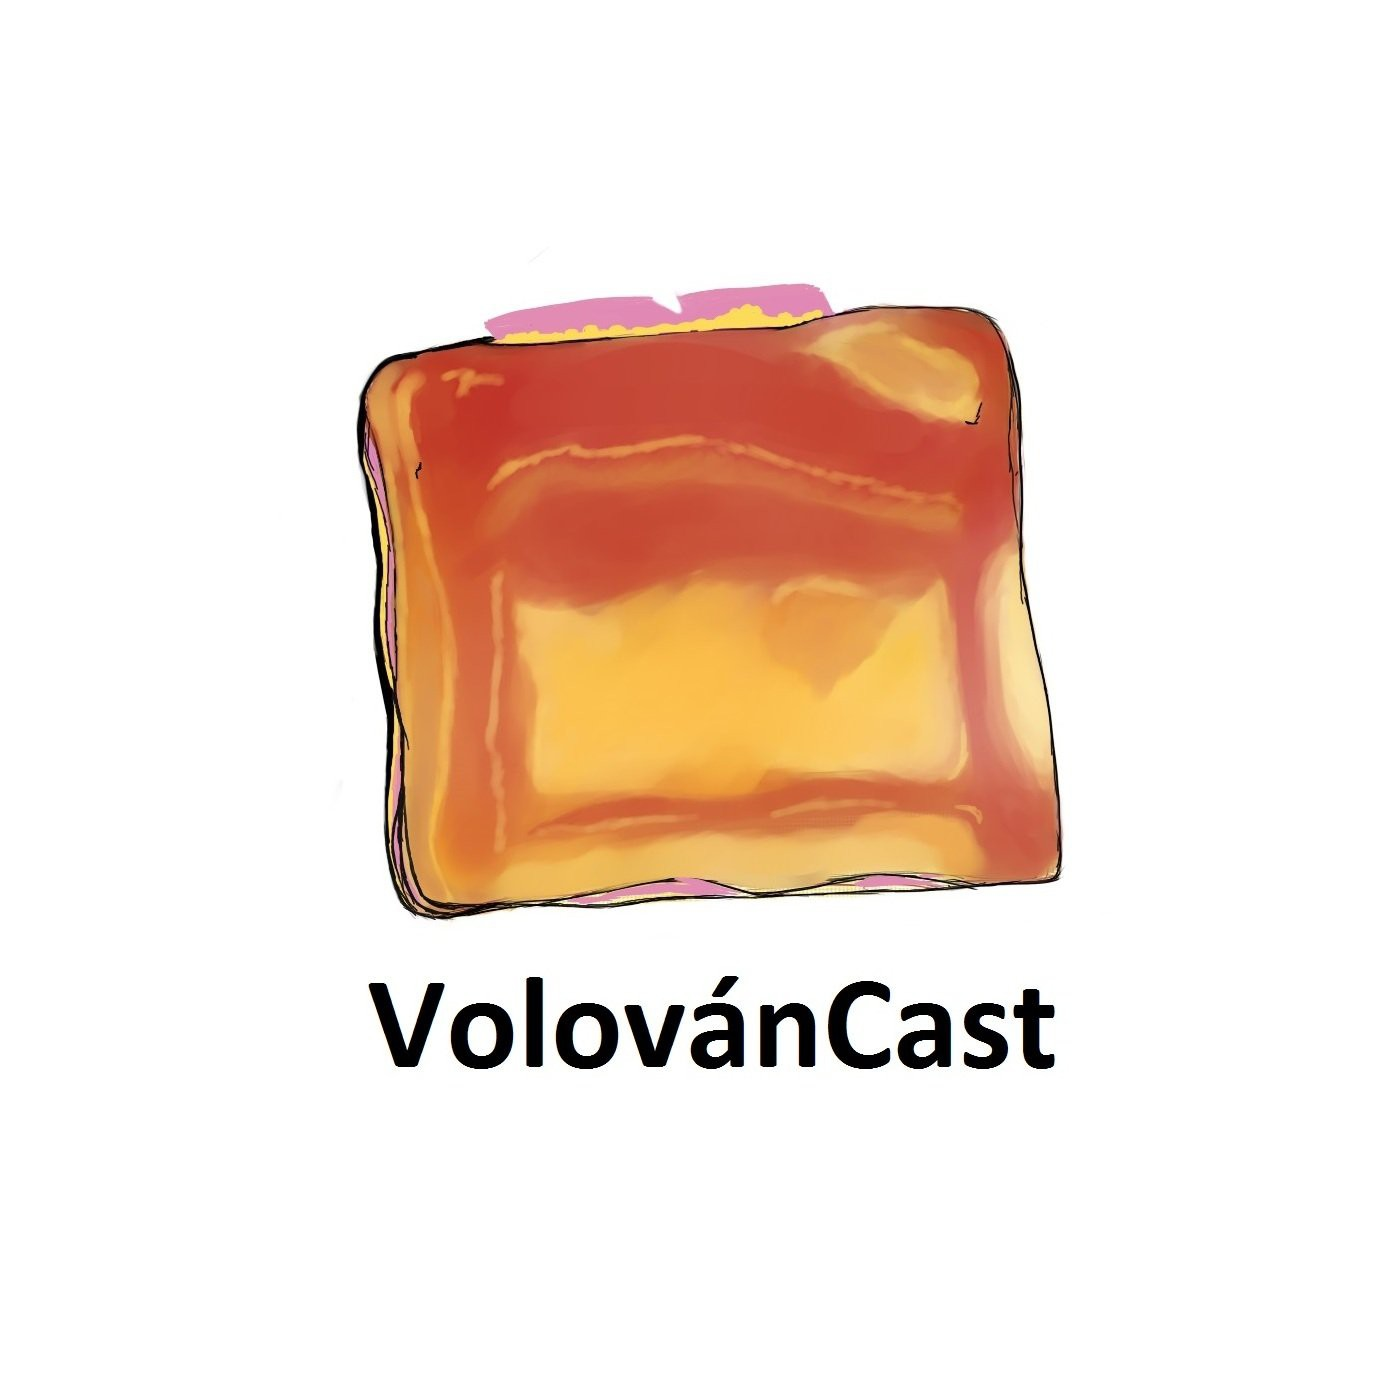 <![CDATA[VolovanCast]]>